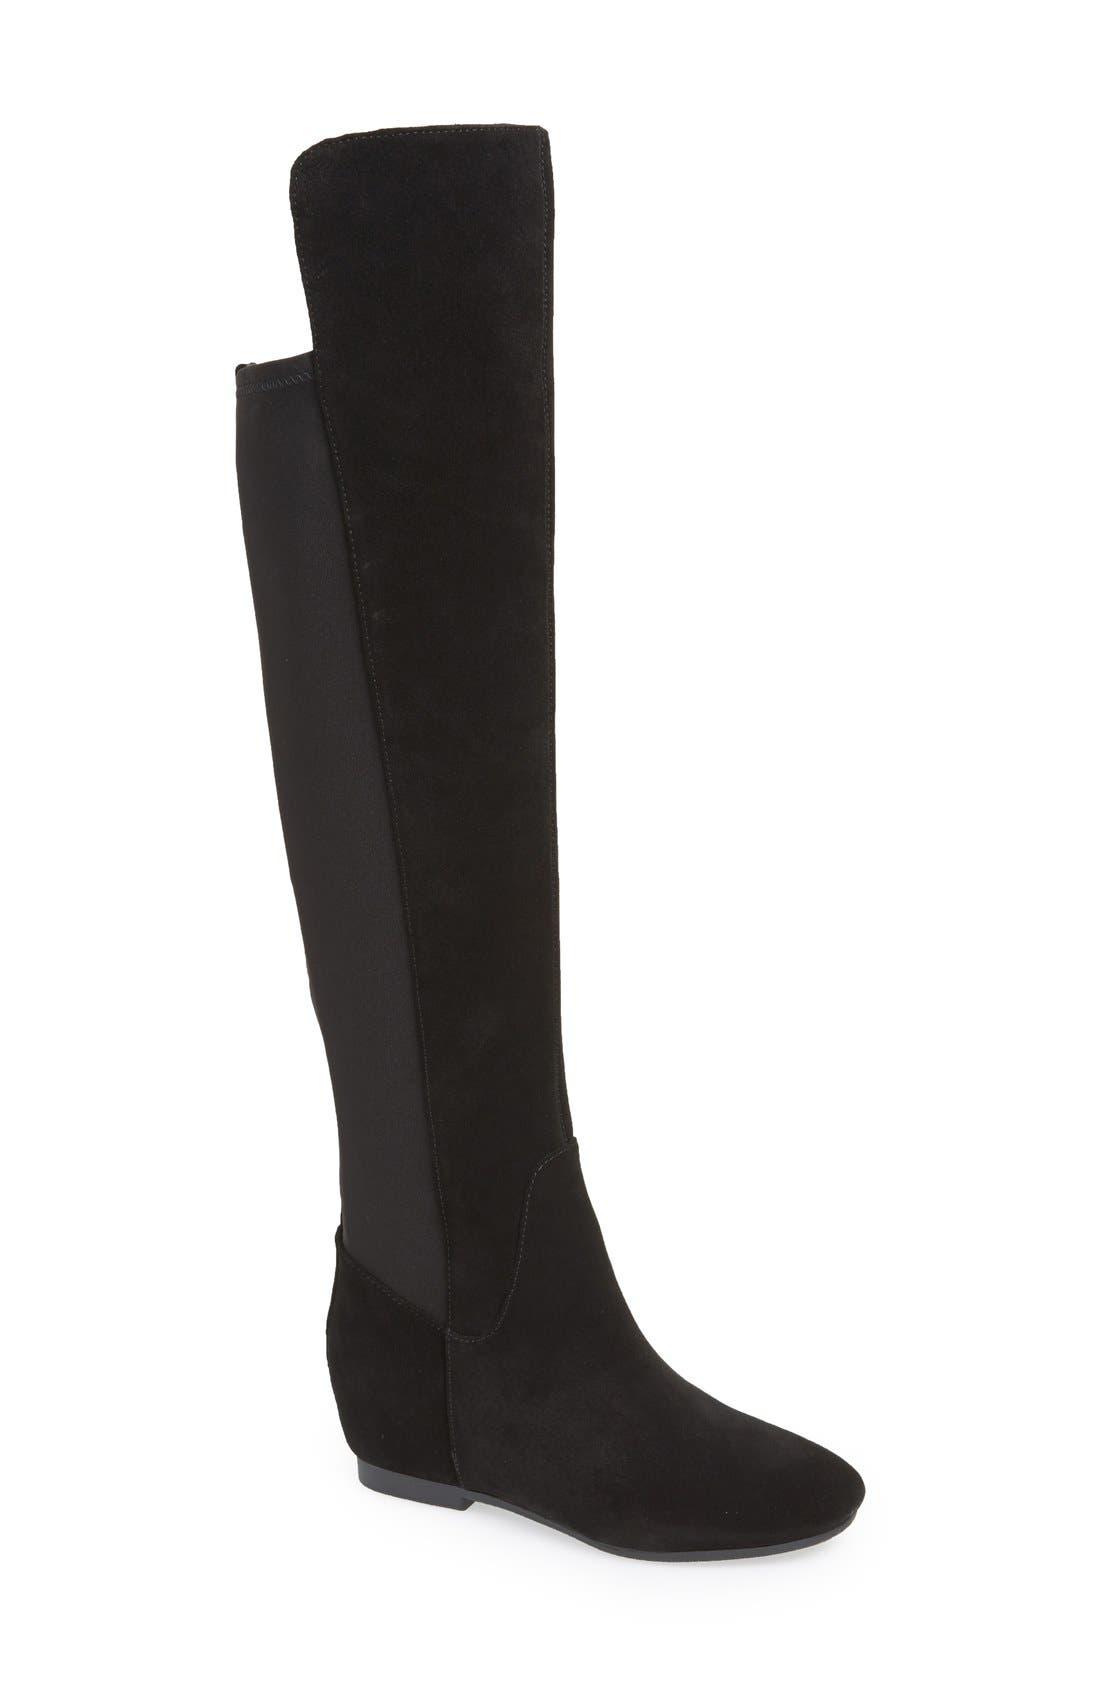 Main Image - Nine West 'Tiberia' Over the Knee Boot (Women)